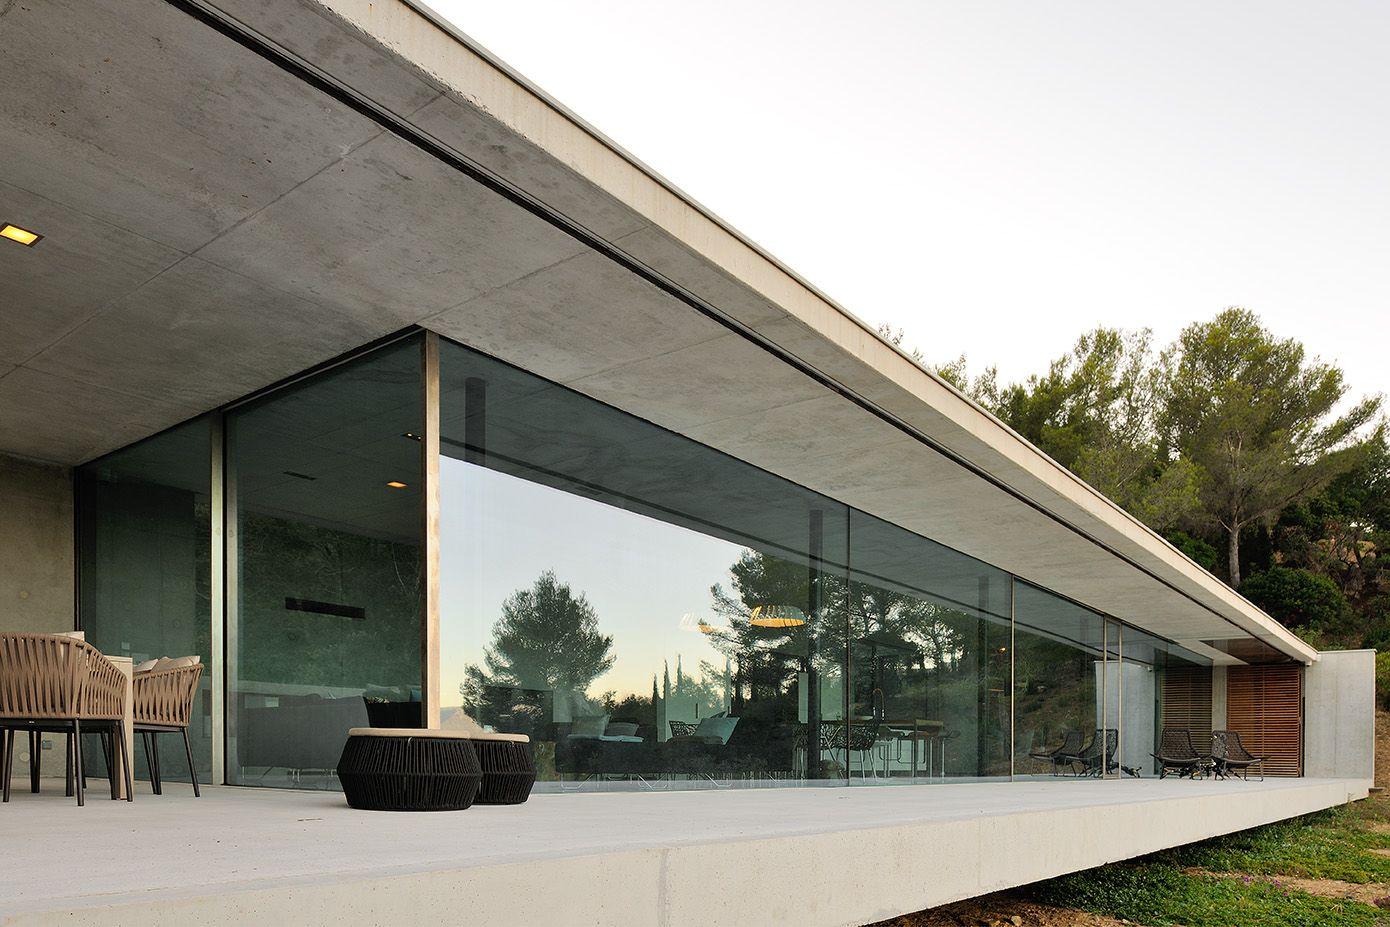 Architettura Case Moderne Idee maison-mira-ra-01-aum-minassian-architectes-architecture